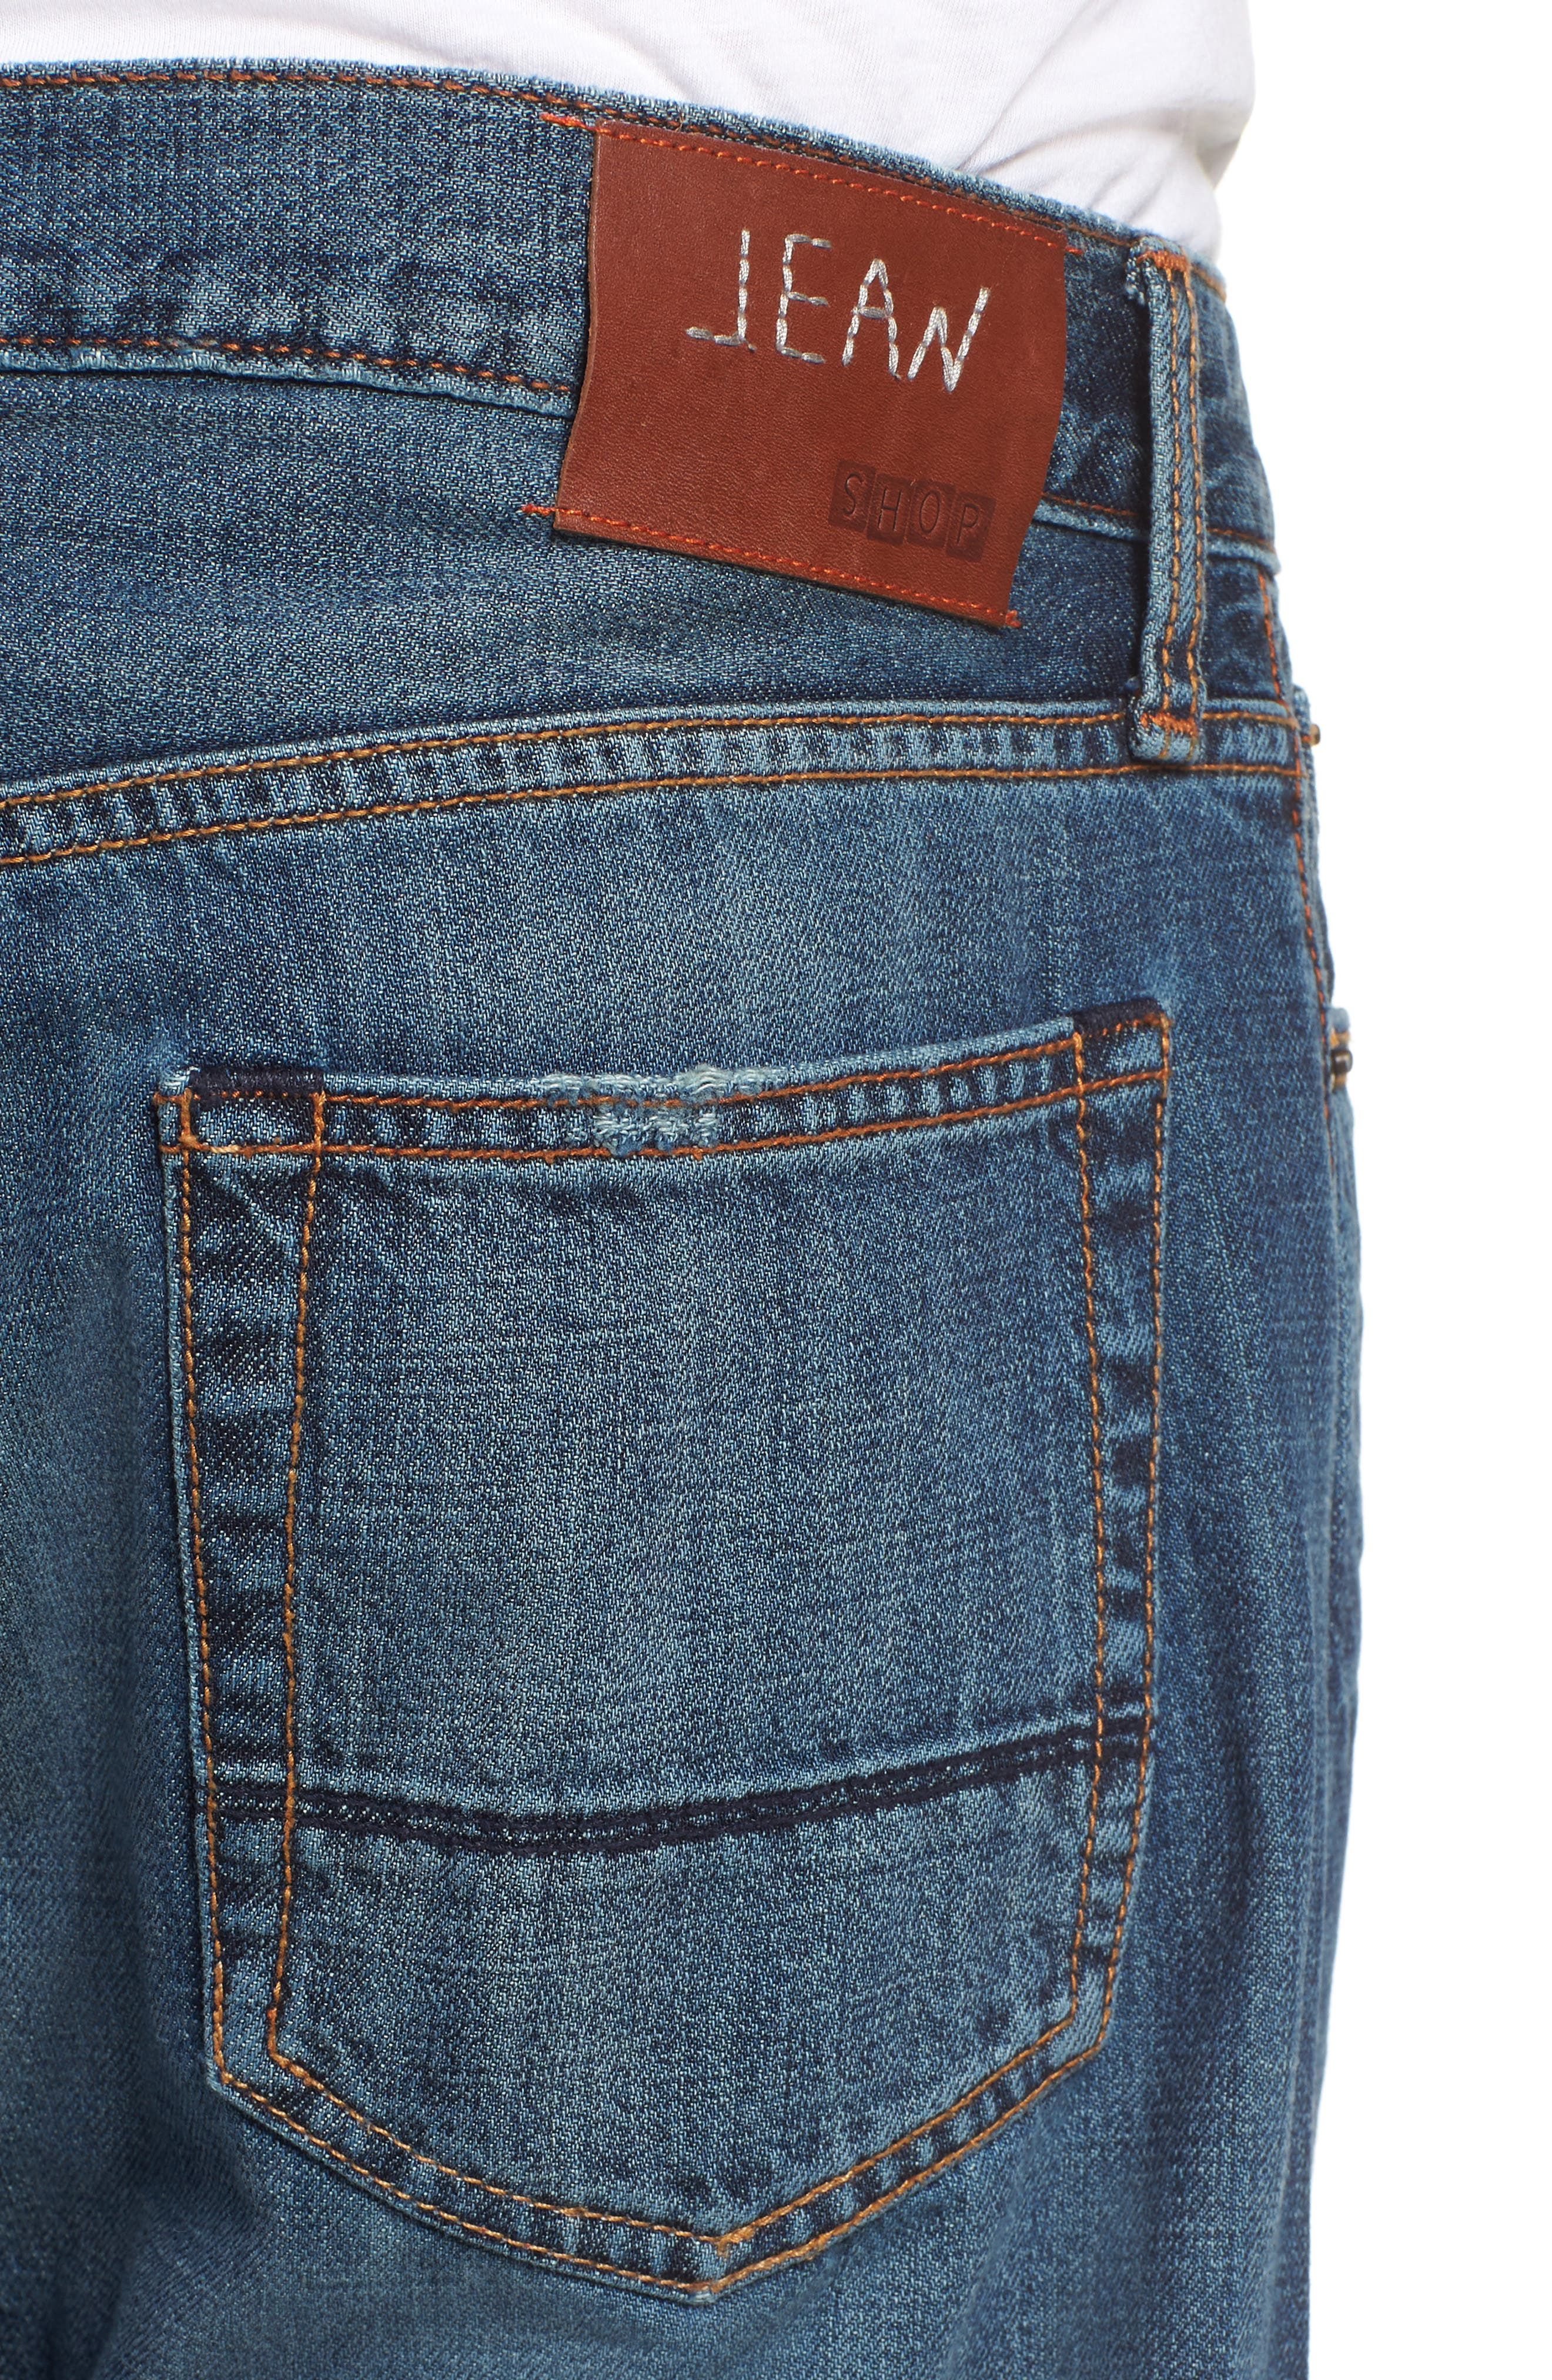 Jim Slim Fit Jeans,                             Alternate thumbnail 4, color,                             Greenwood